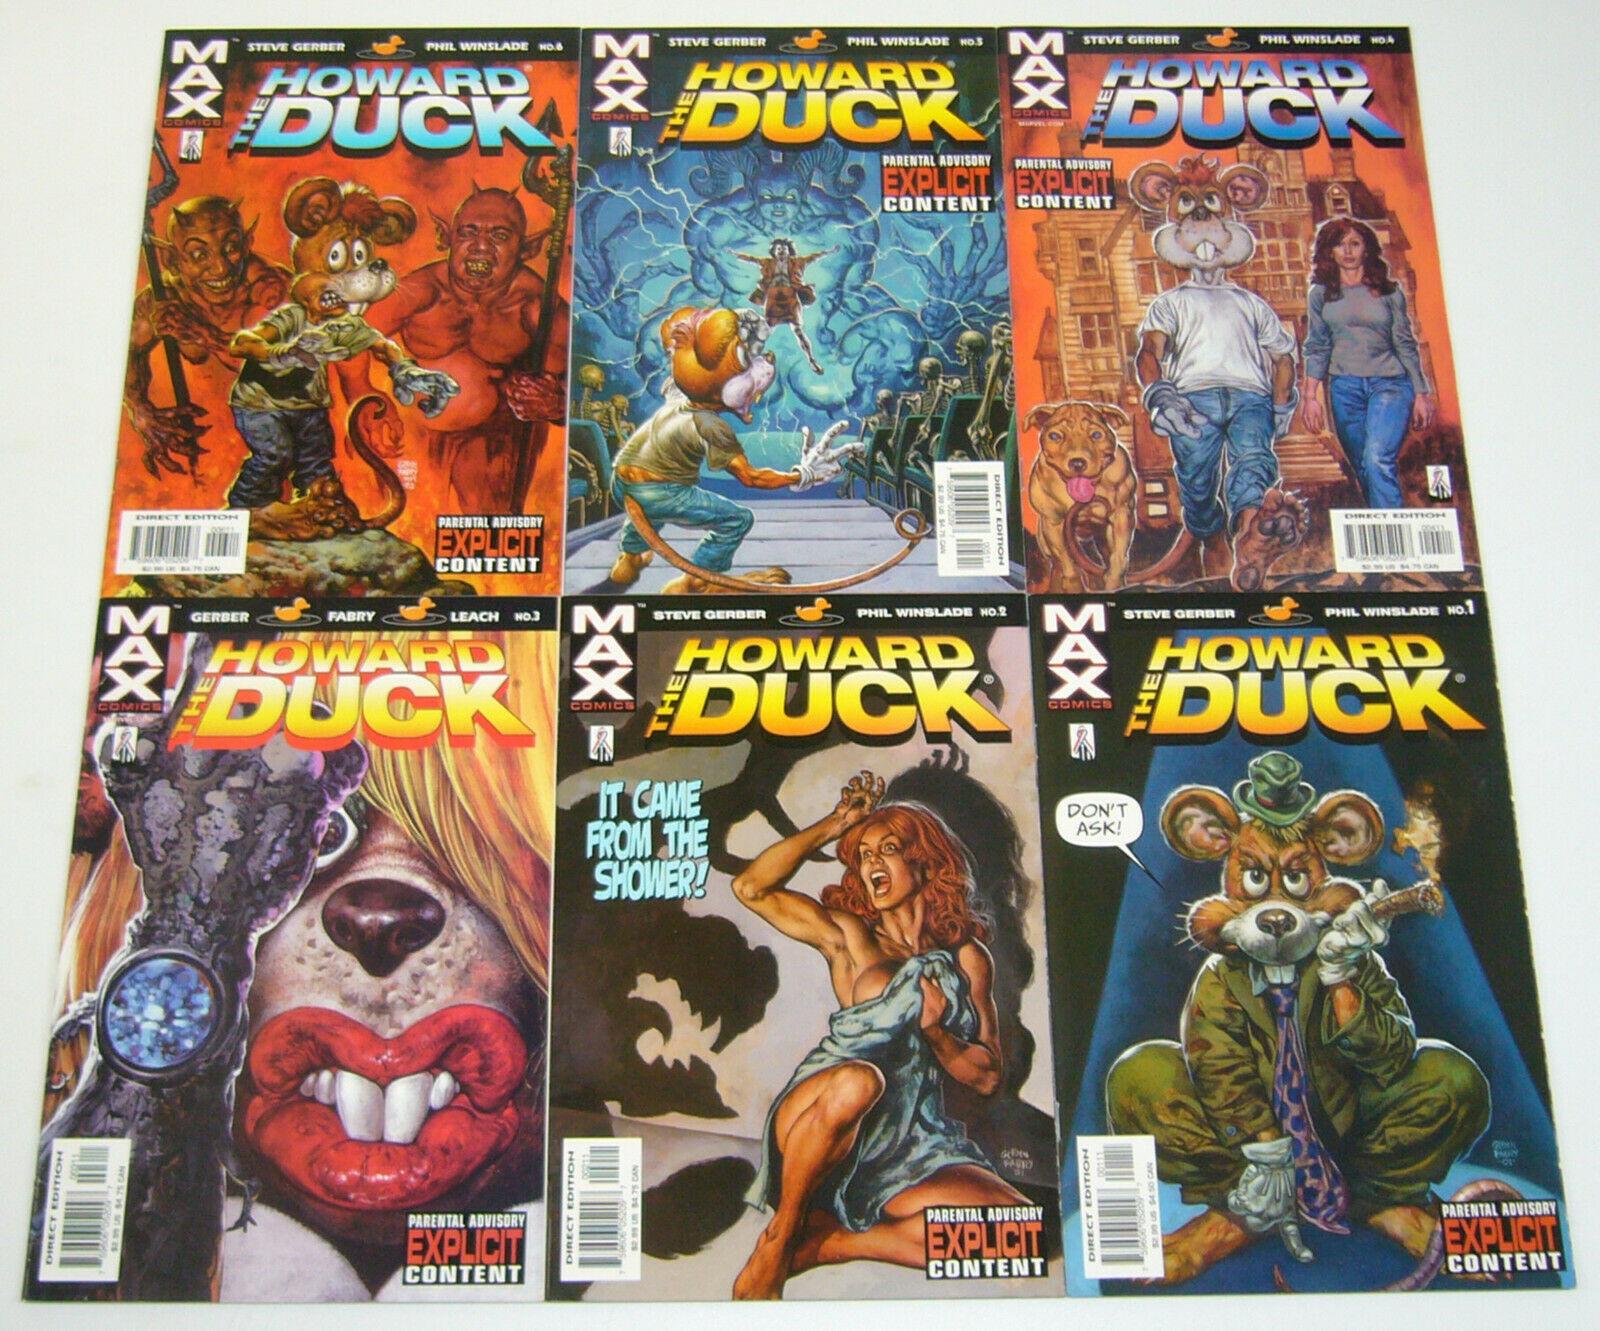 Marvel VF//NM Comics Book Howard the Duck #3 Vol 6